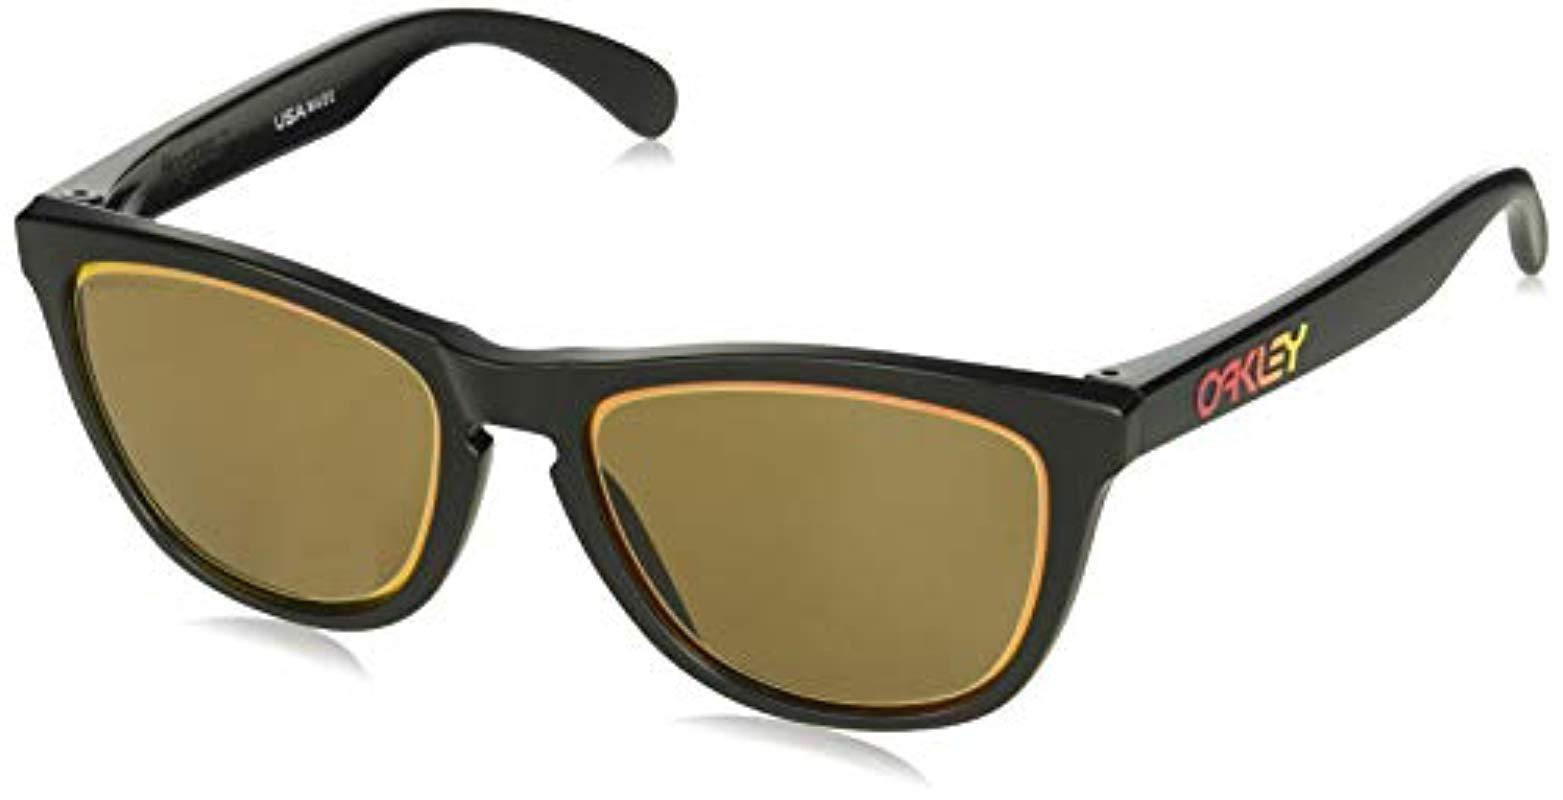 03339574e4 Ray-Ban. Men s Frogskins Sunglasses